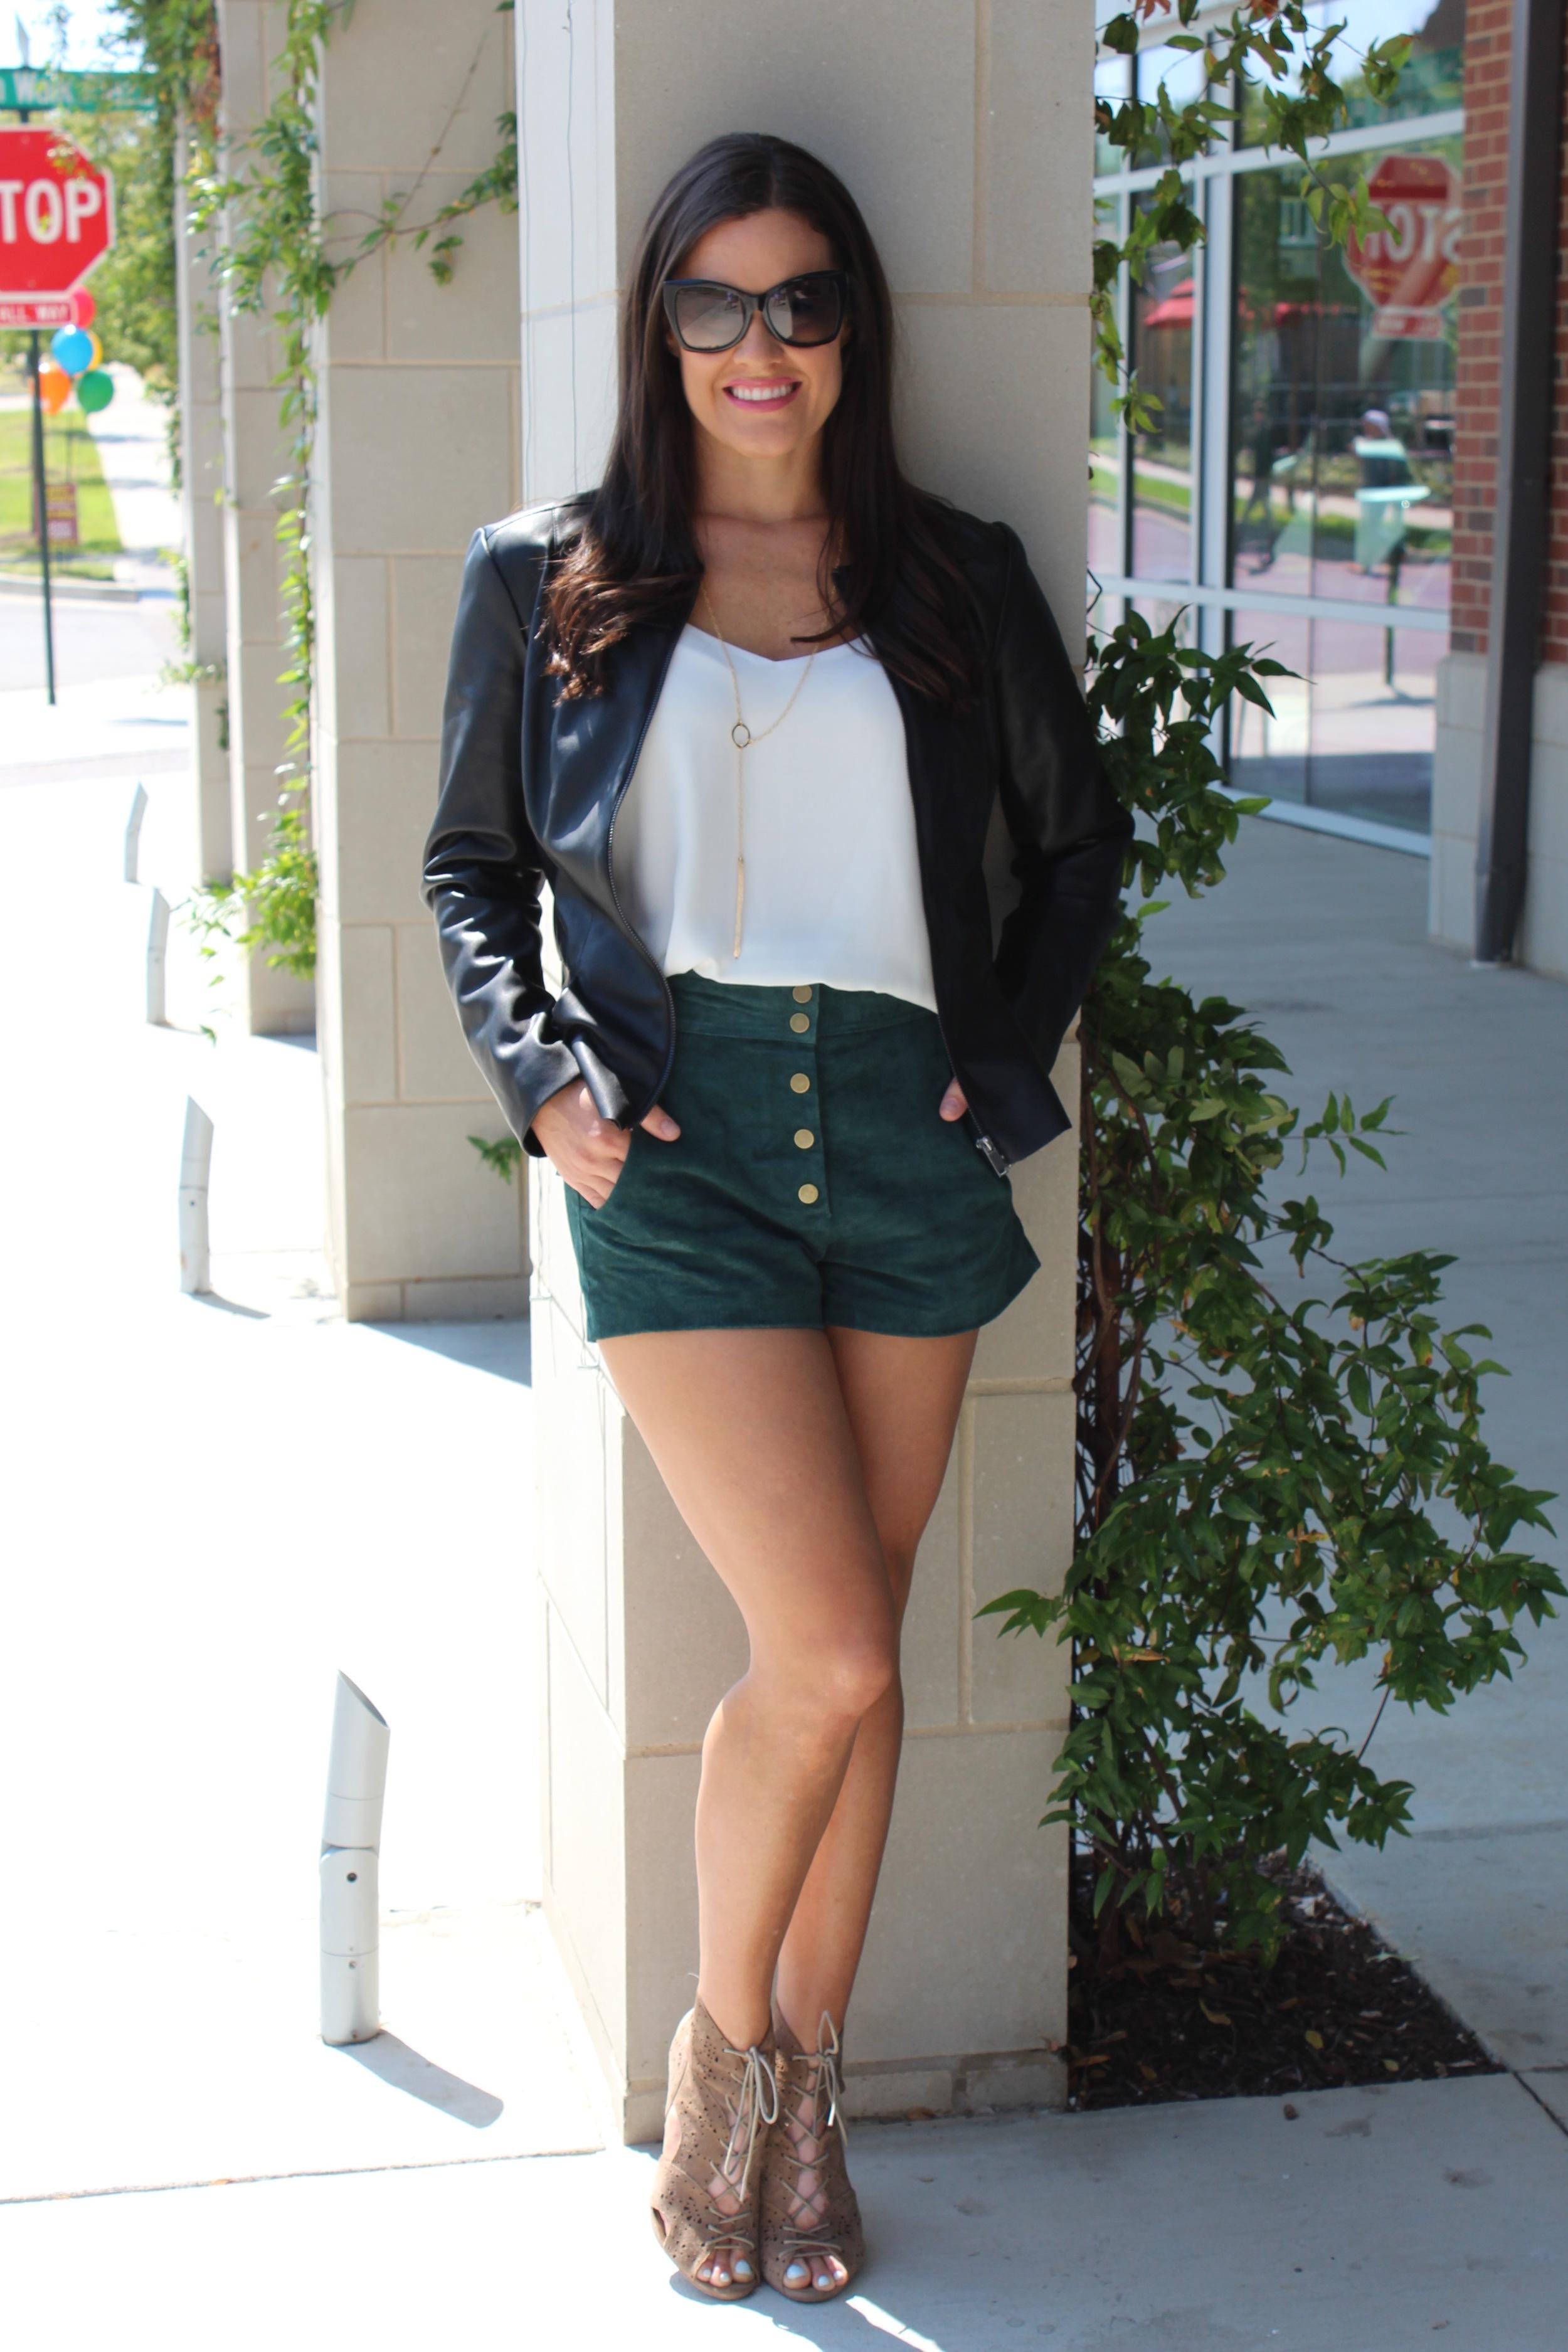 Alexis Allison